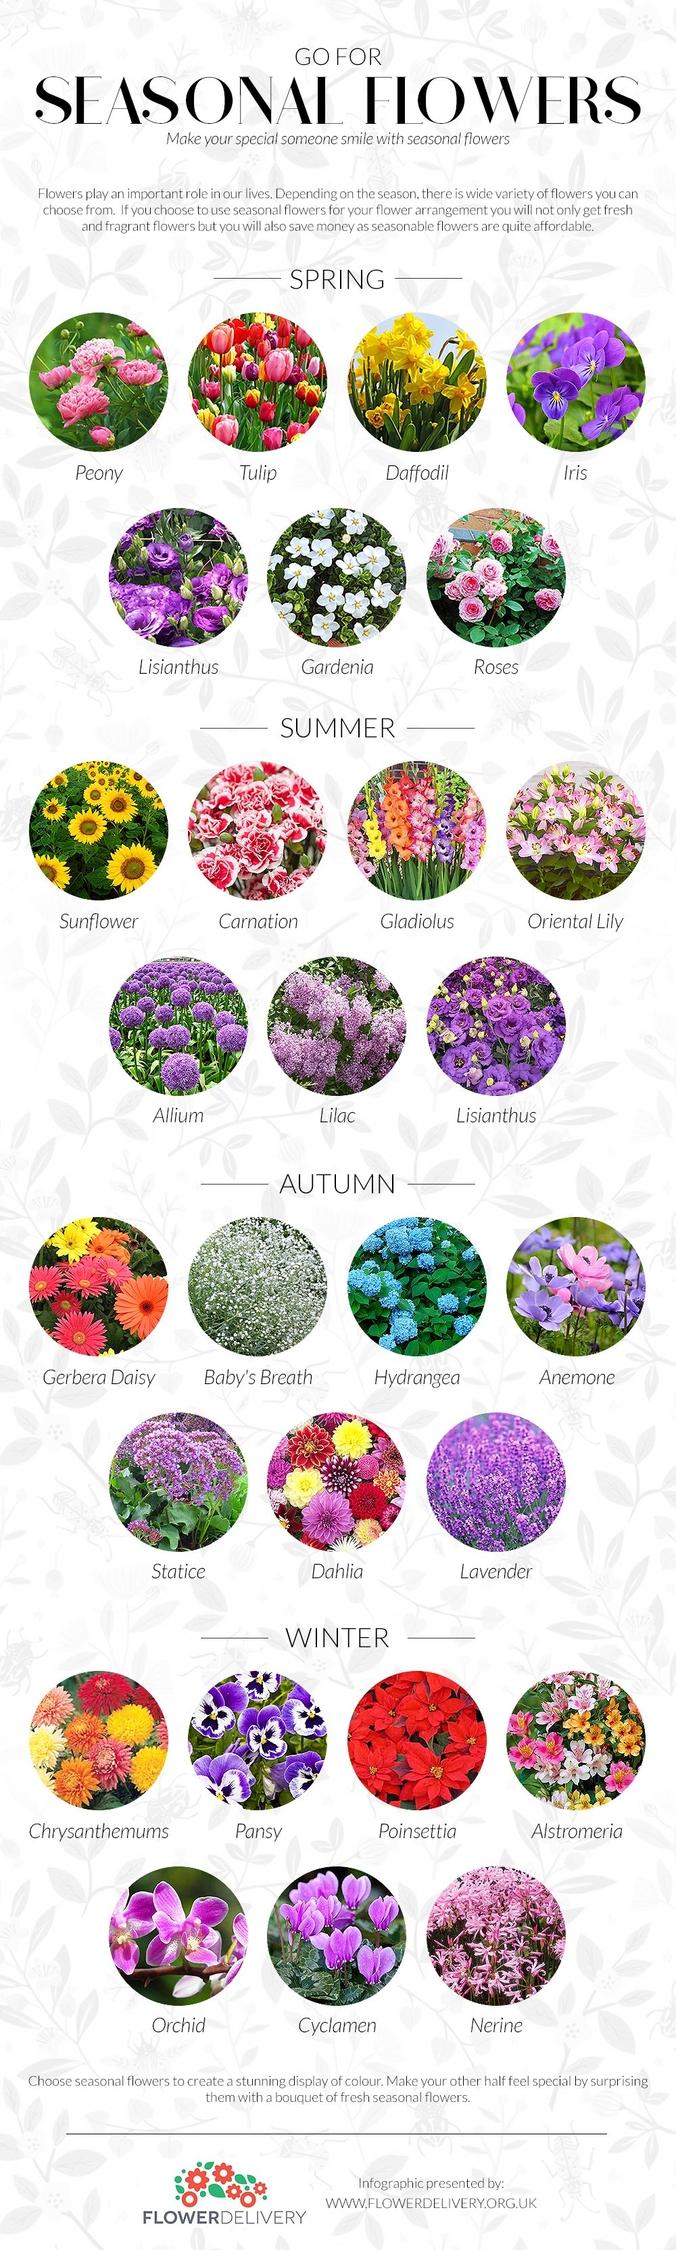 seasonal flowers charm beauty.  - alisonhart | ello